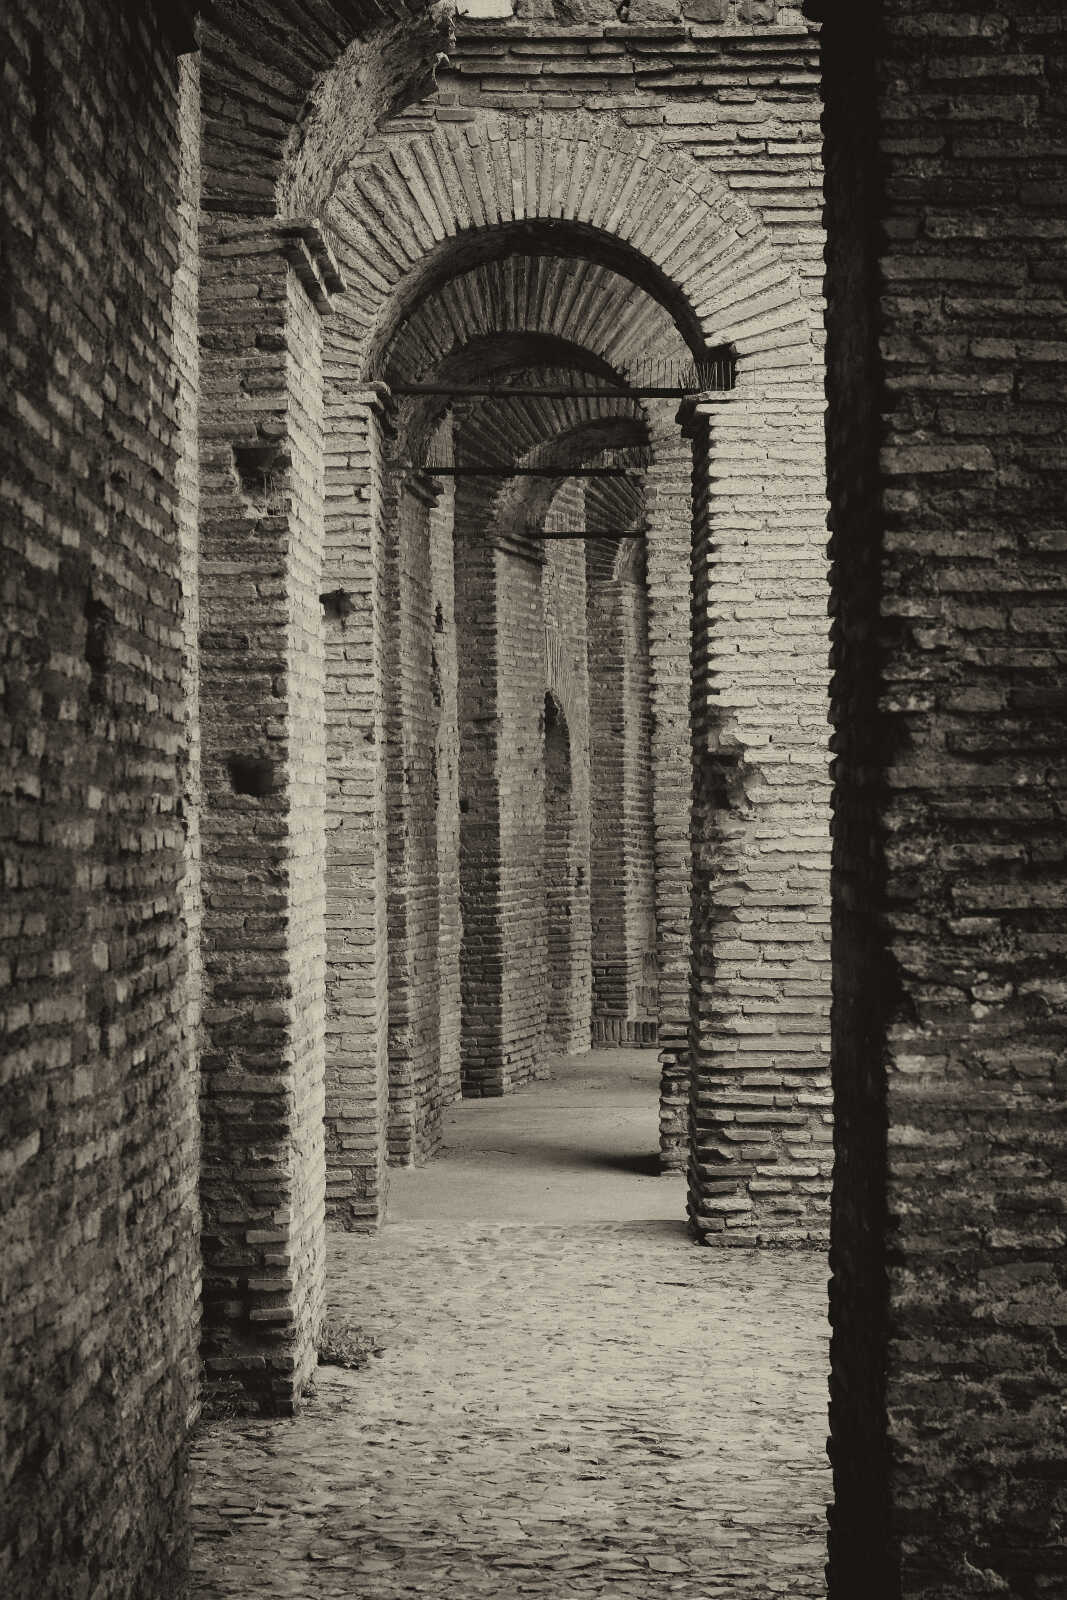 Roman walkway